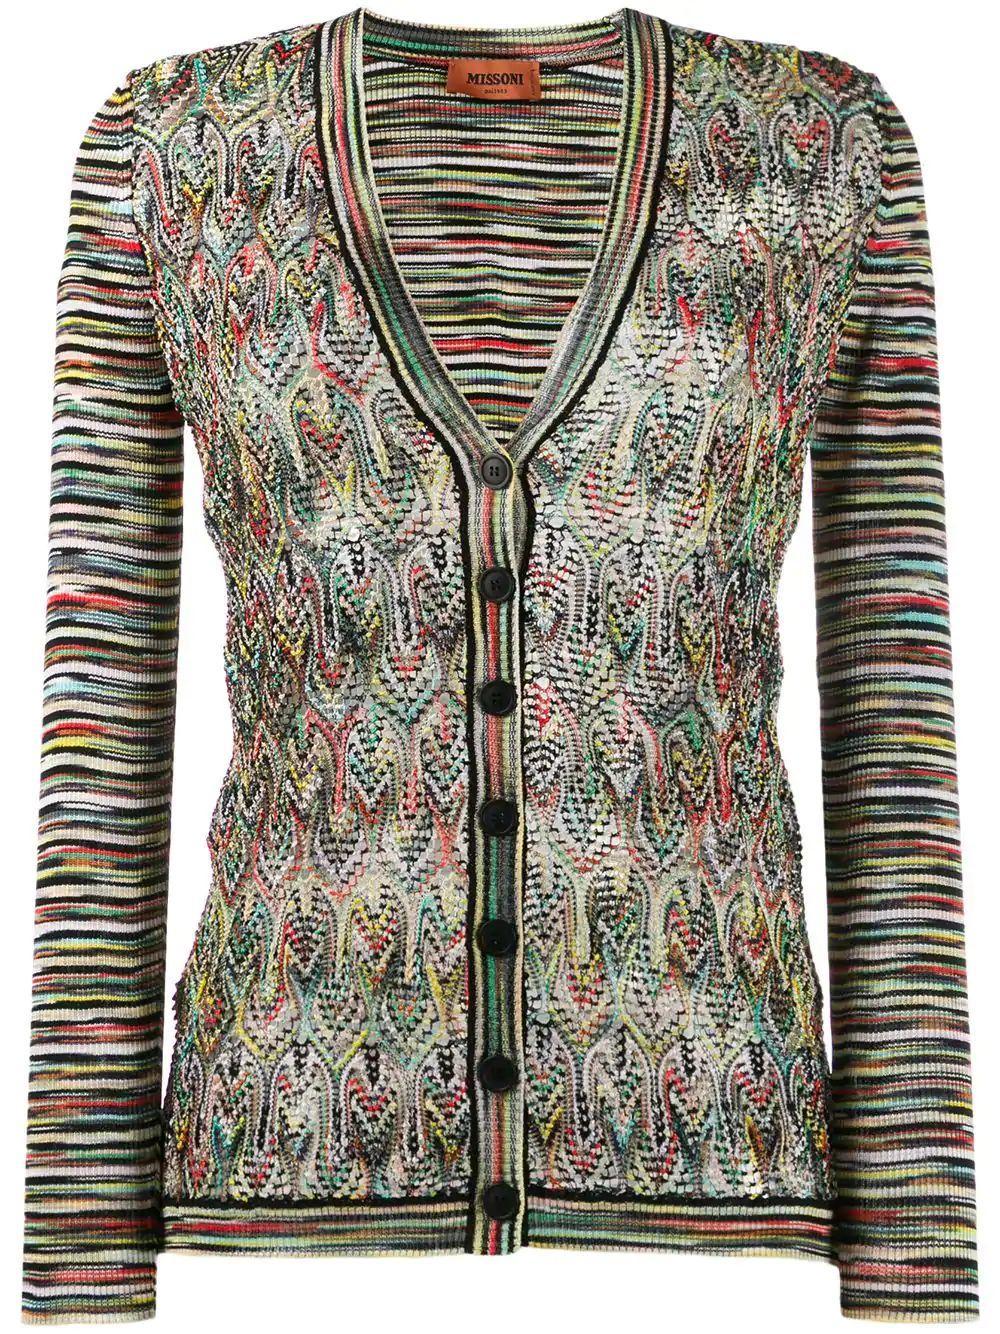 Long Sleeve Knit V-Neck Cardigan